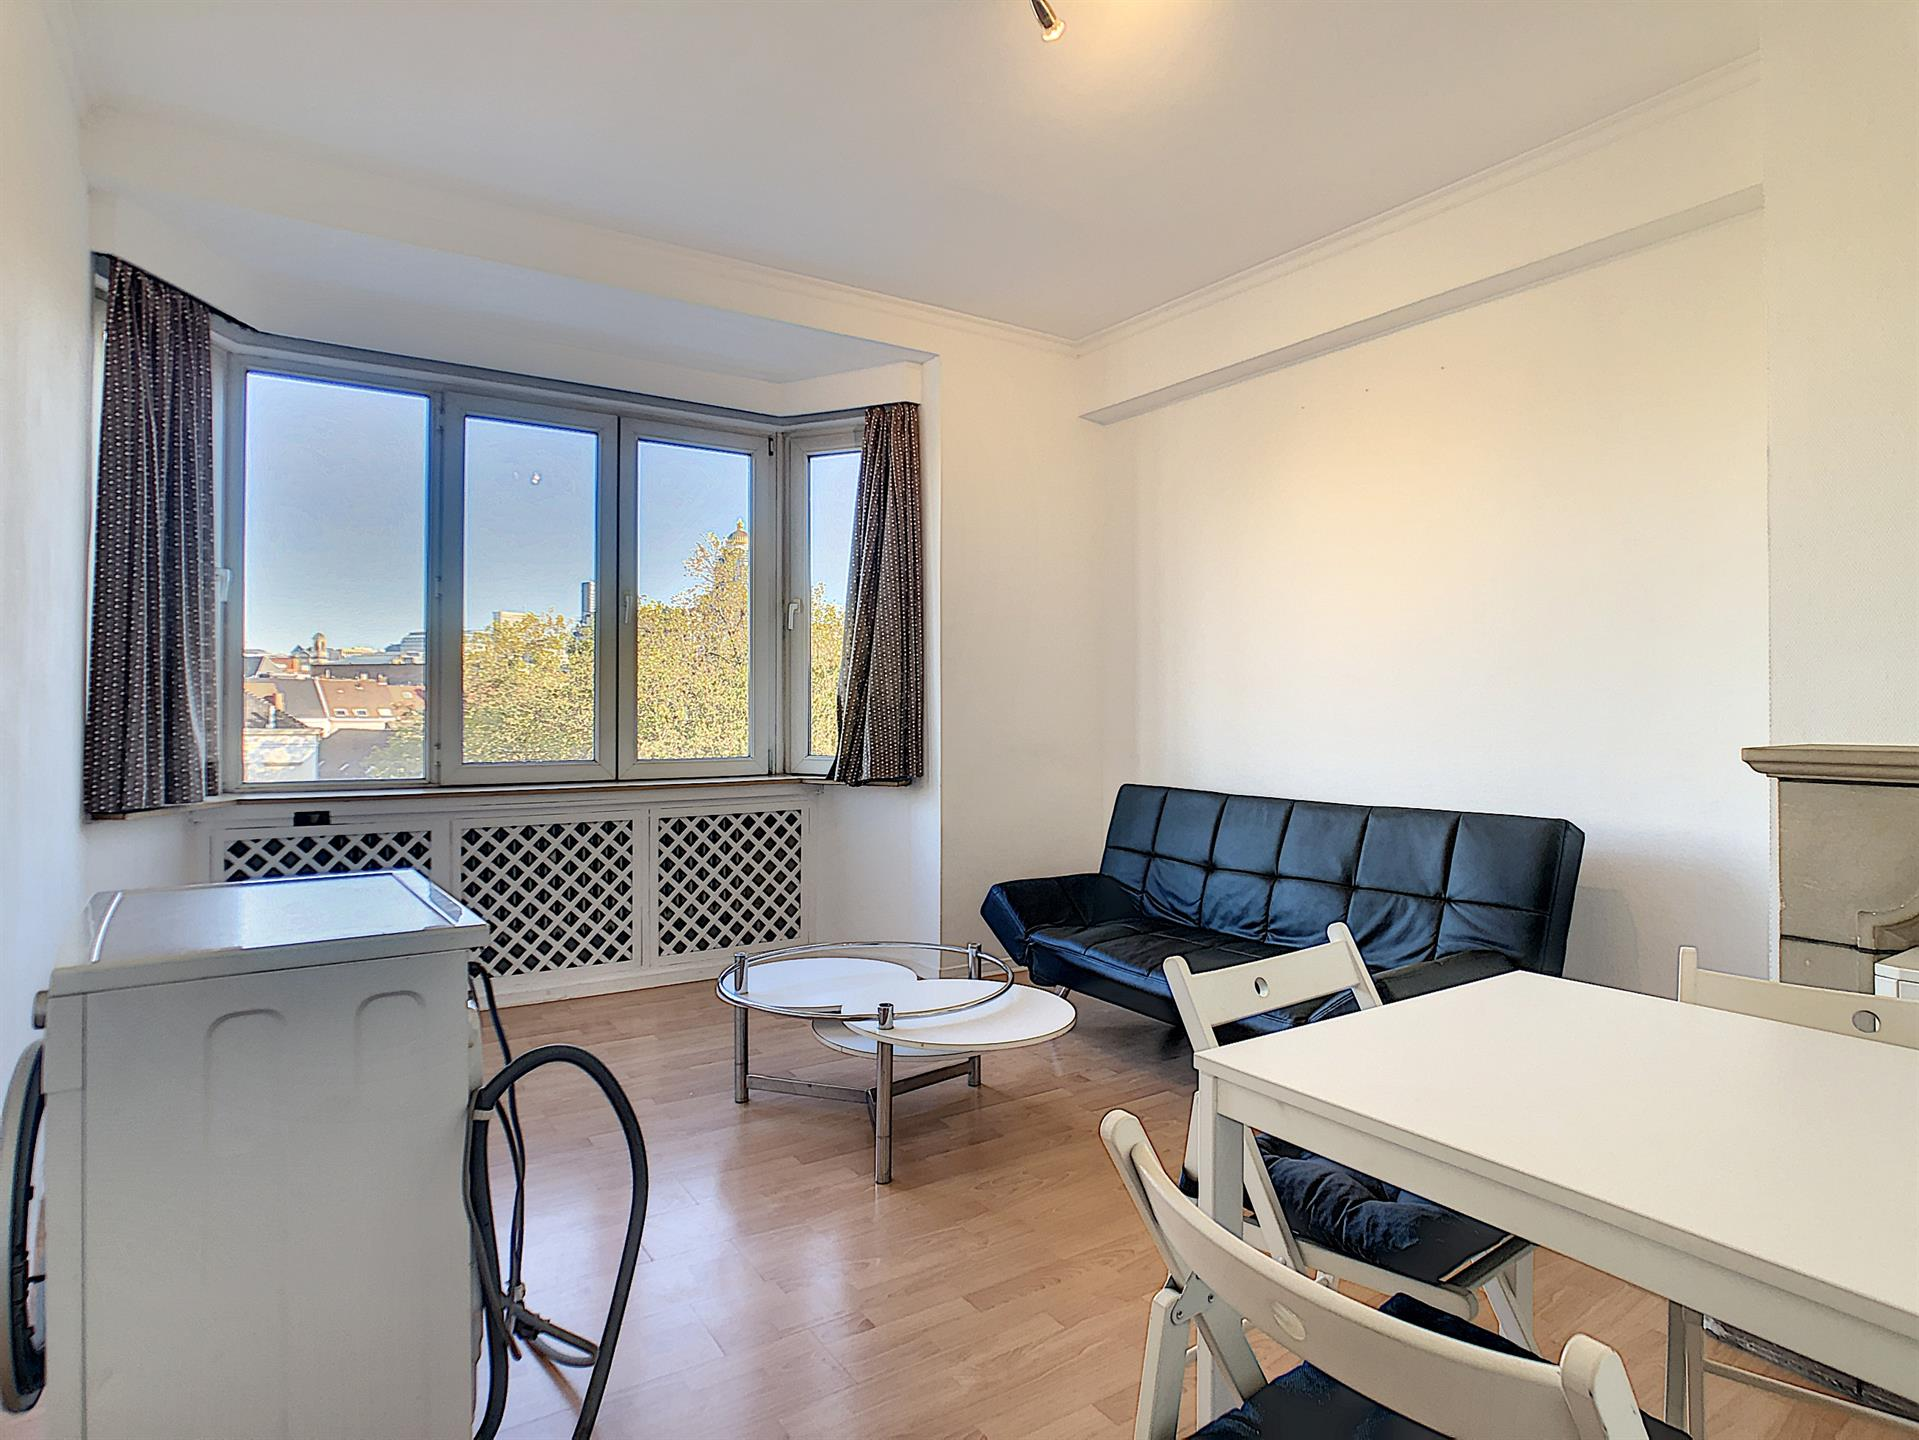 Appartement - Sint-Gillis - #4202152-5